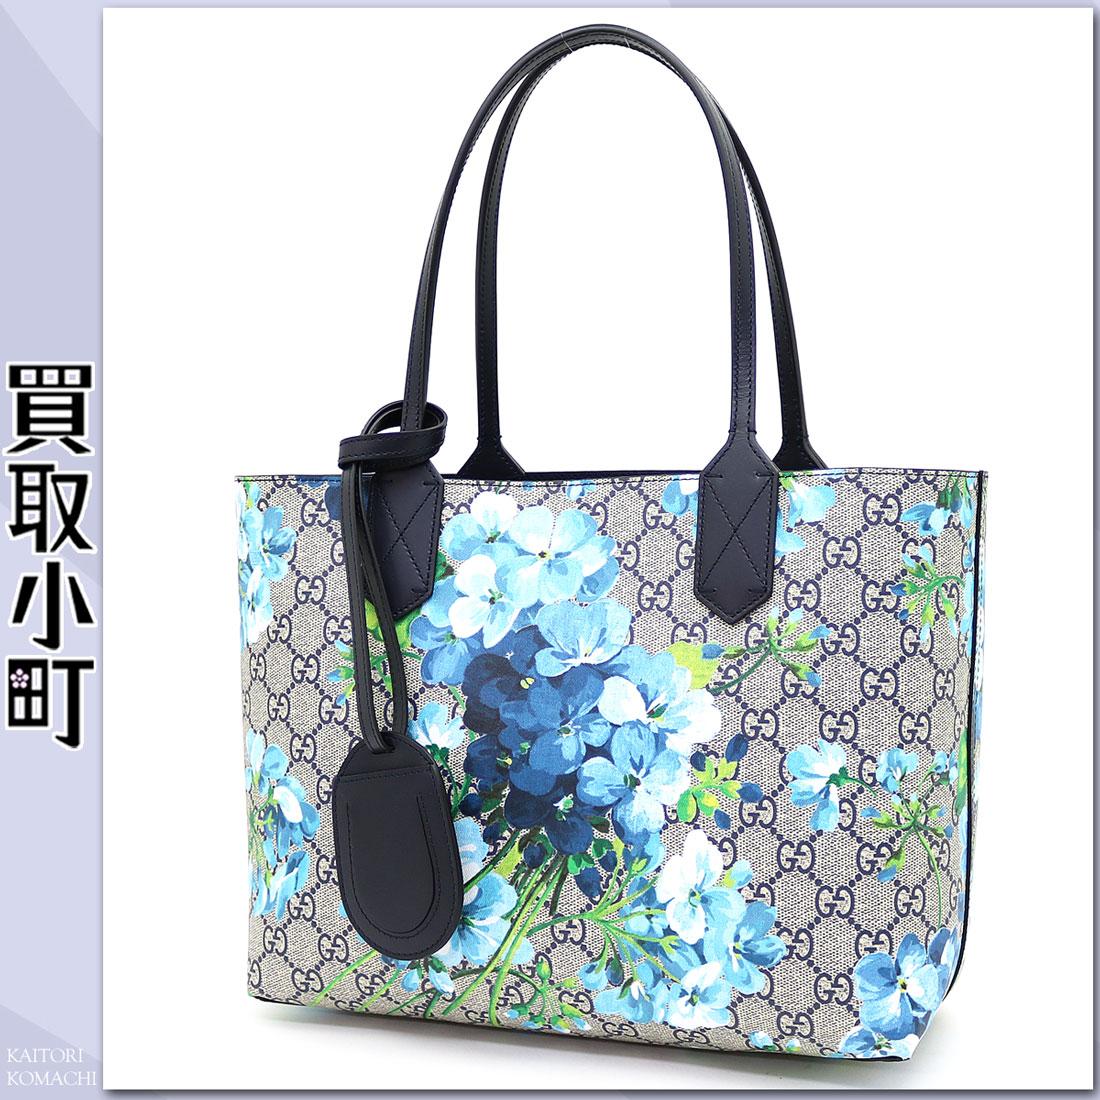 KAITORIKOMACHI | Rakuten Global Market Gucci GG Bloom Reversible Leather Tote Bag Blue GG ...